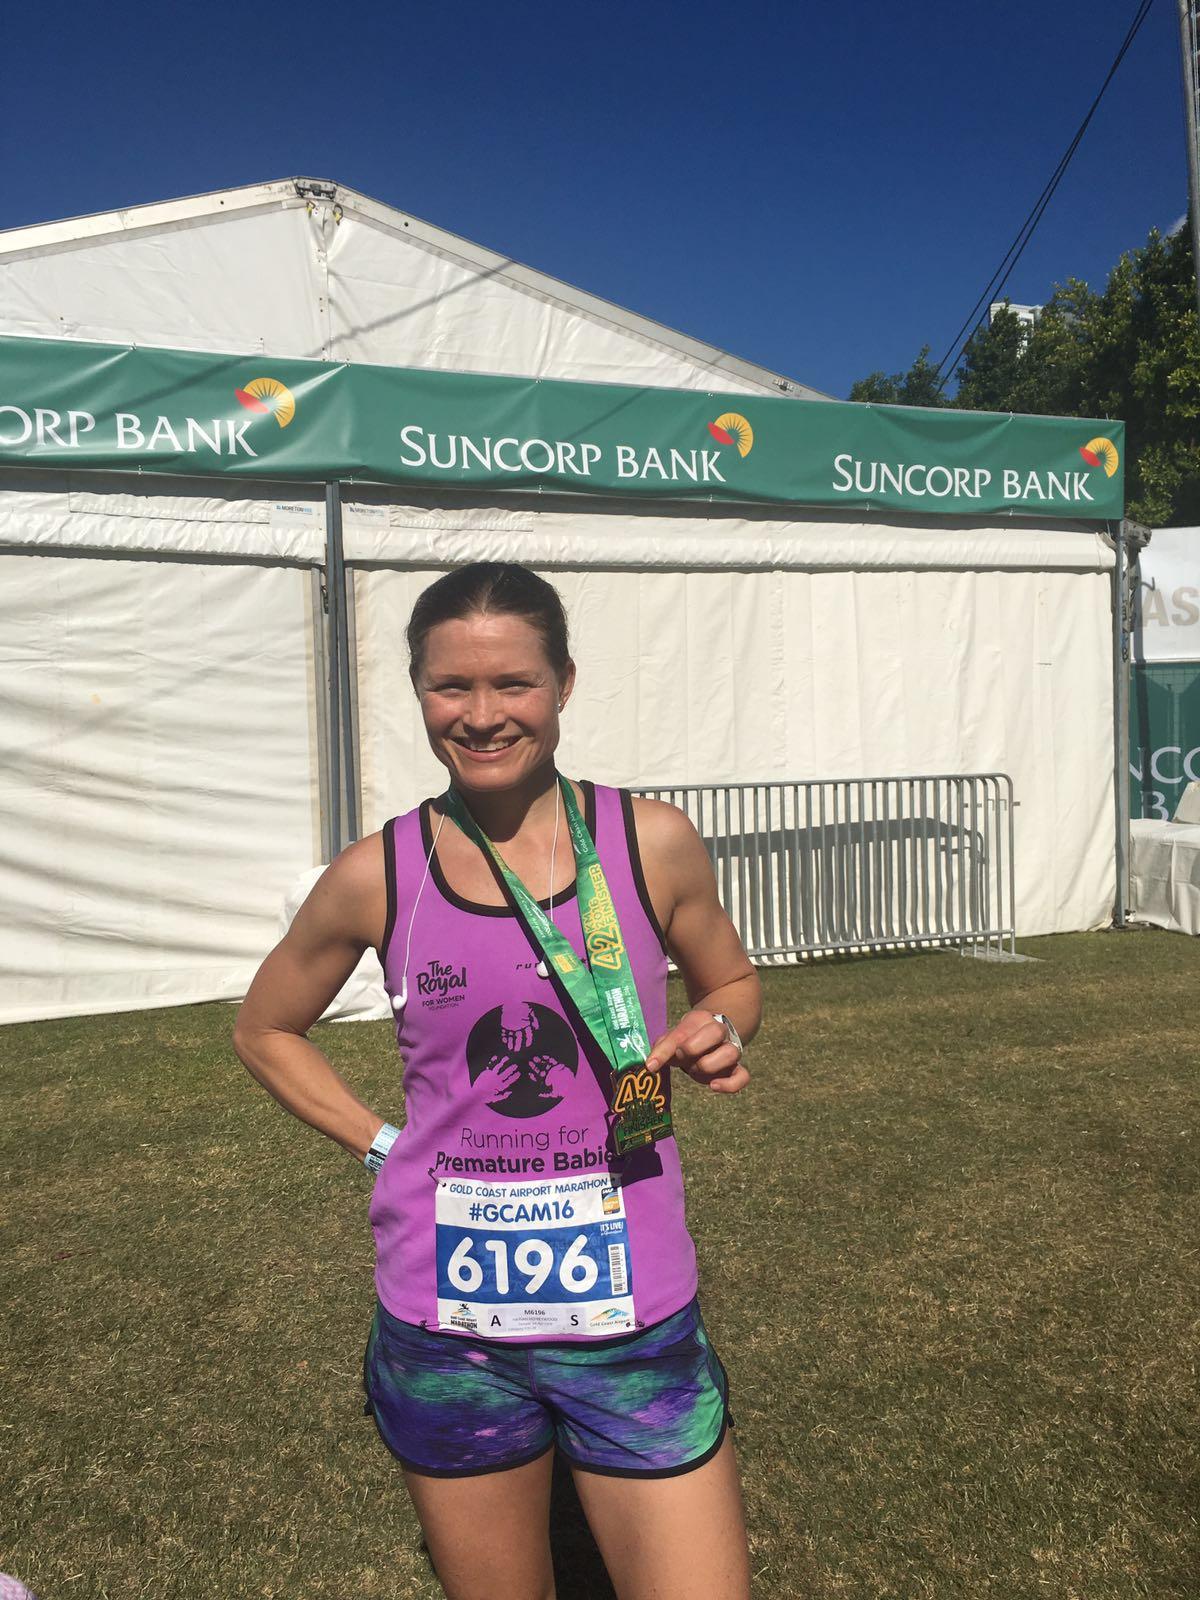 Rachael Honeywood 3.29 marathon - 7min pb